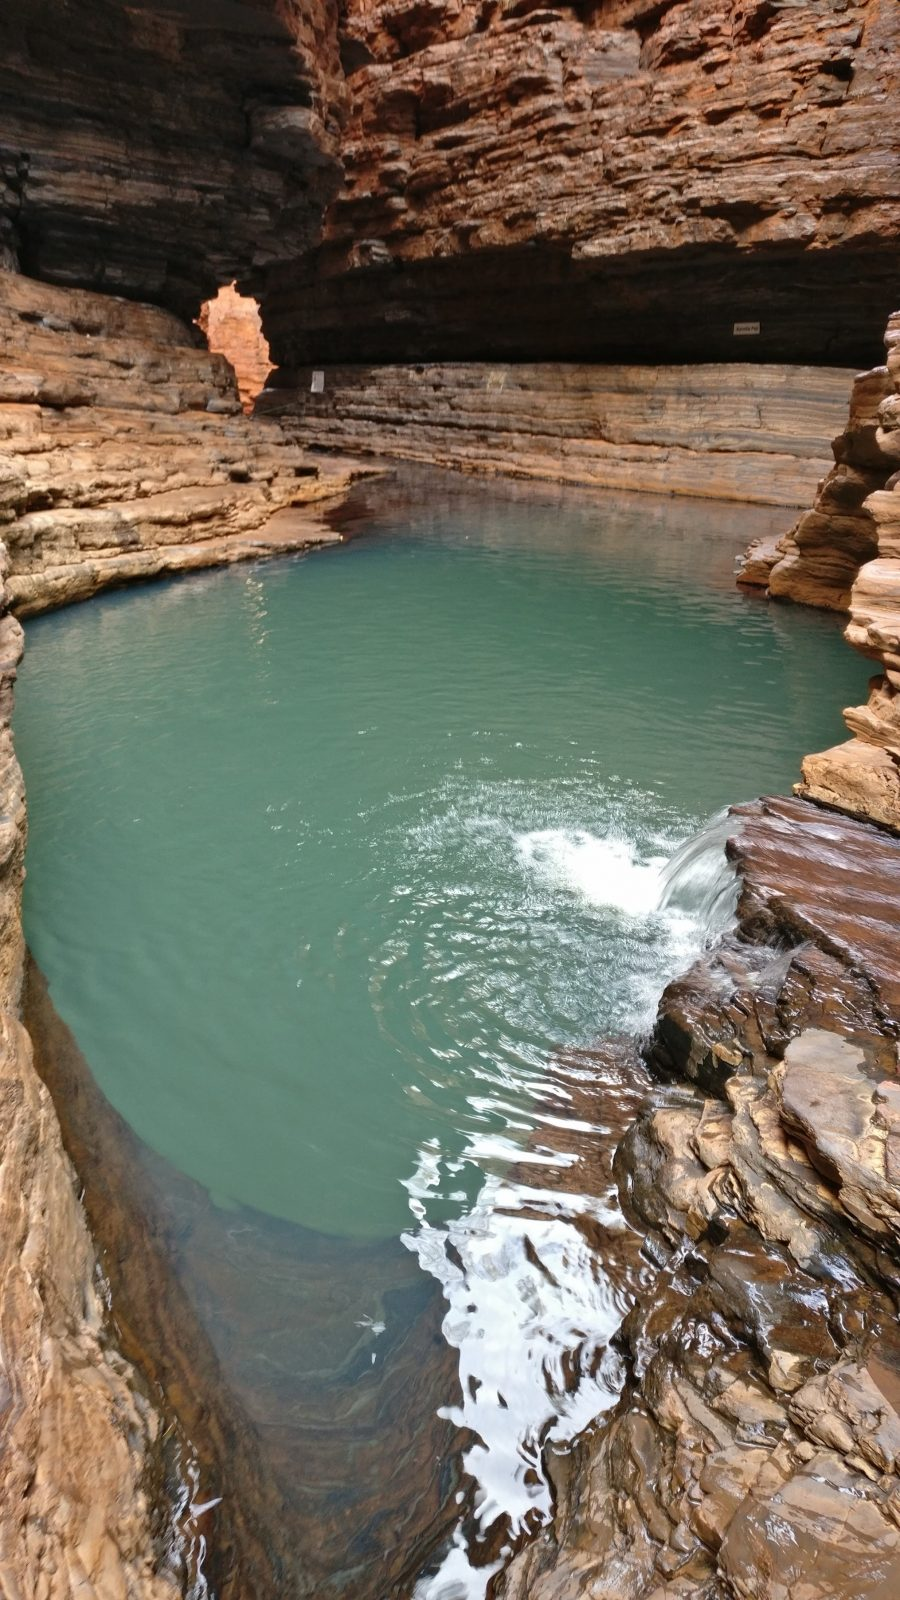 Kermits Pool Hancock Gorge